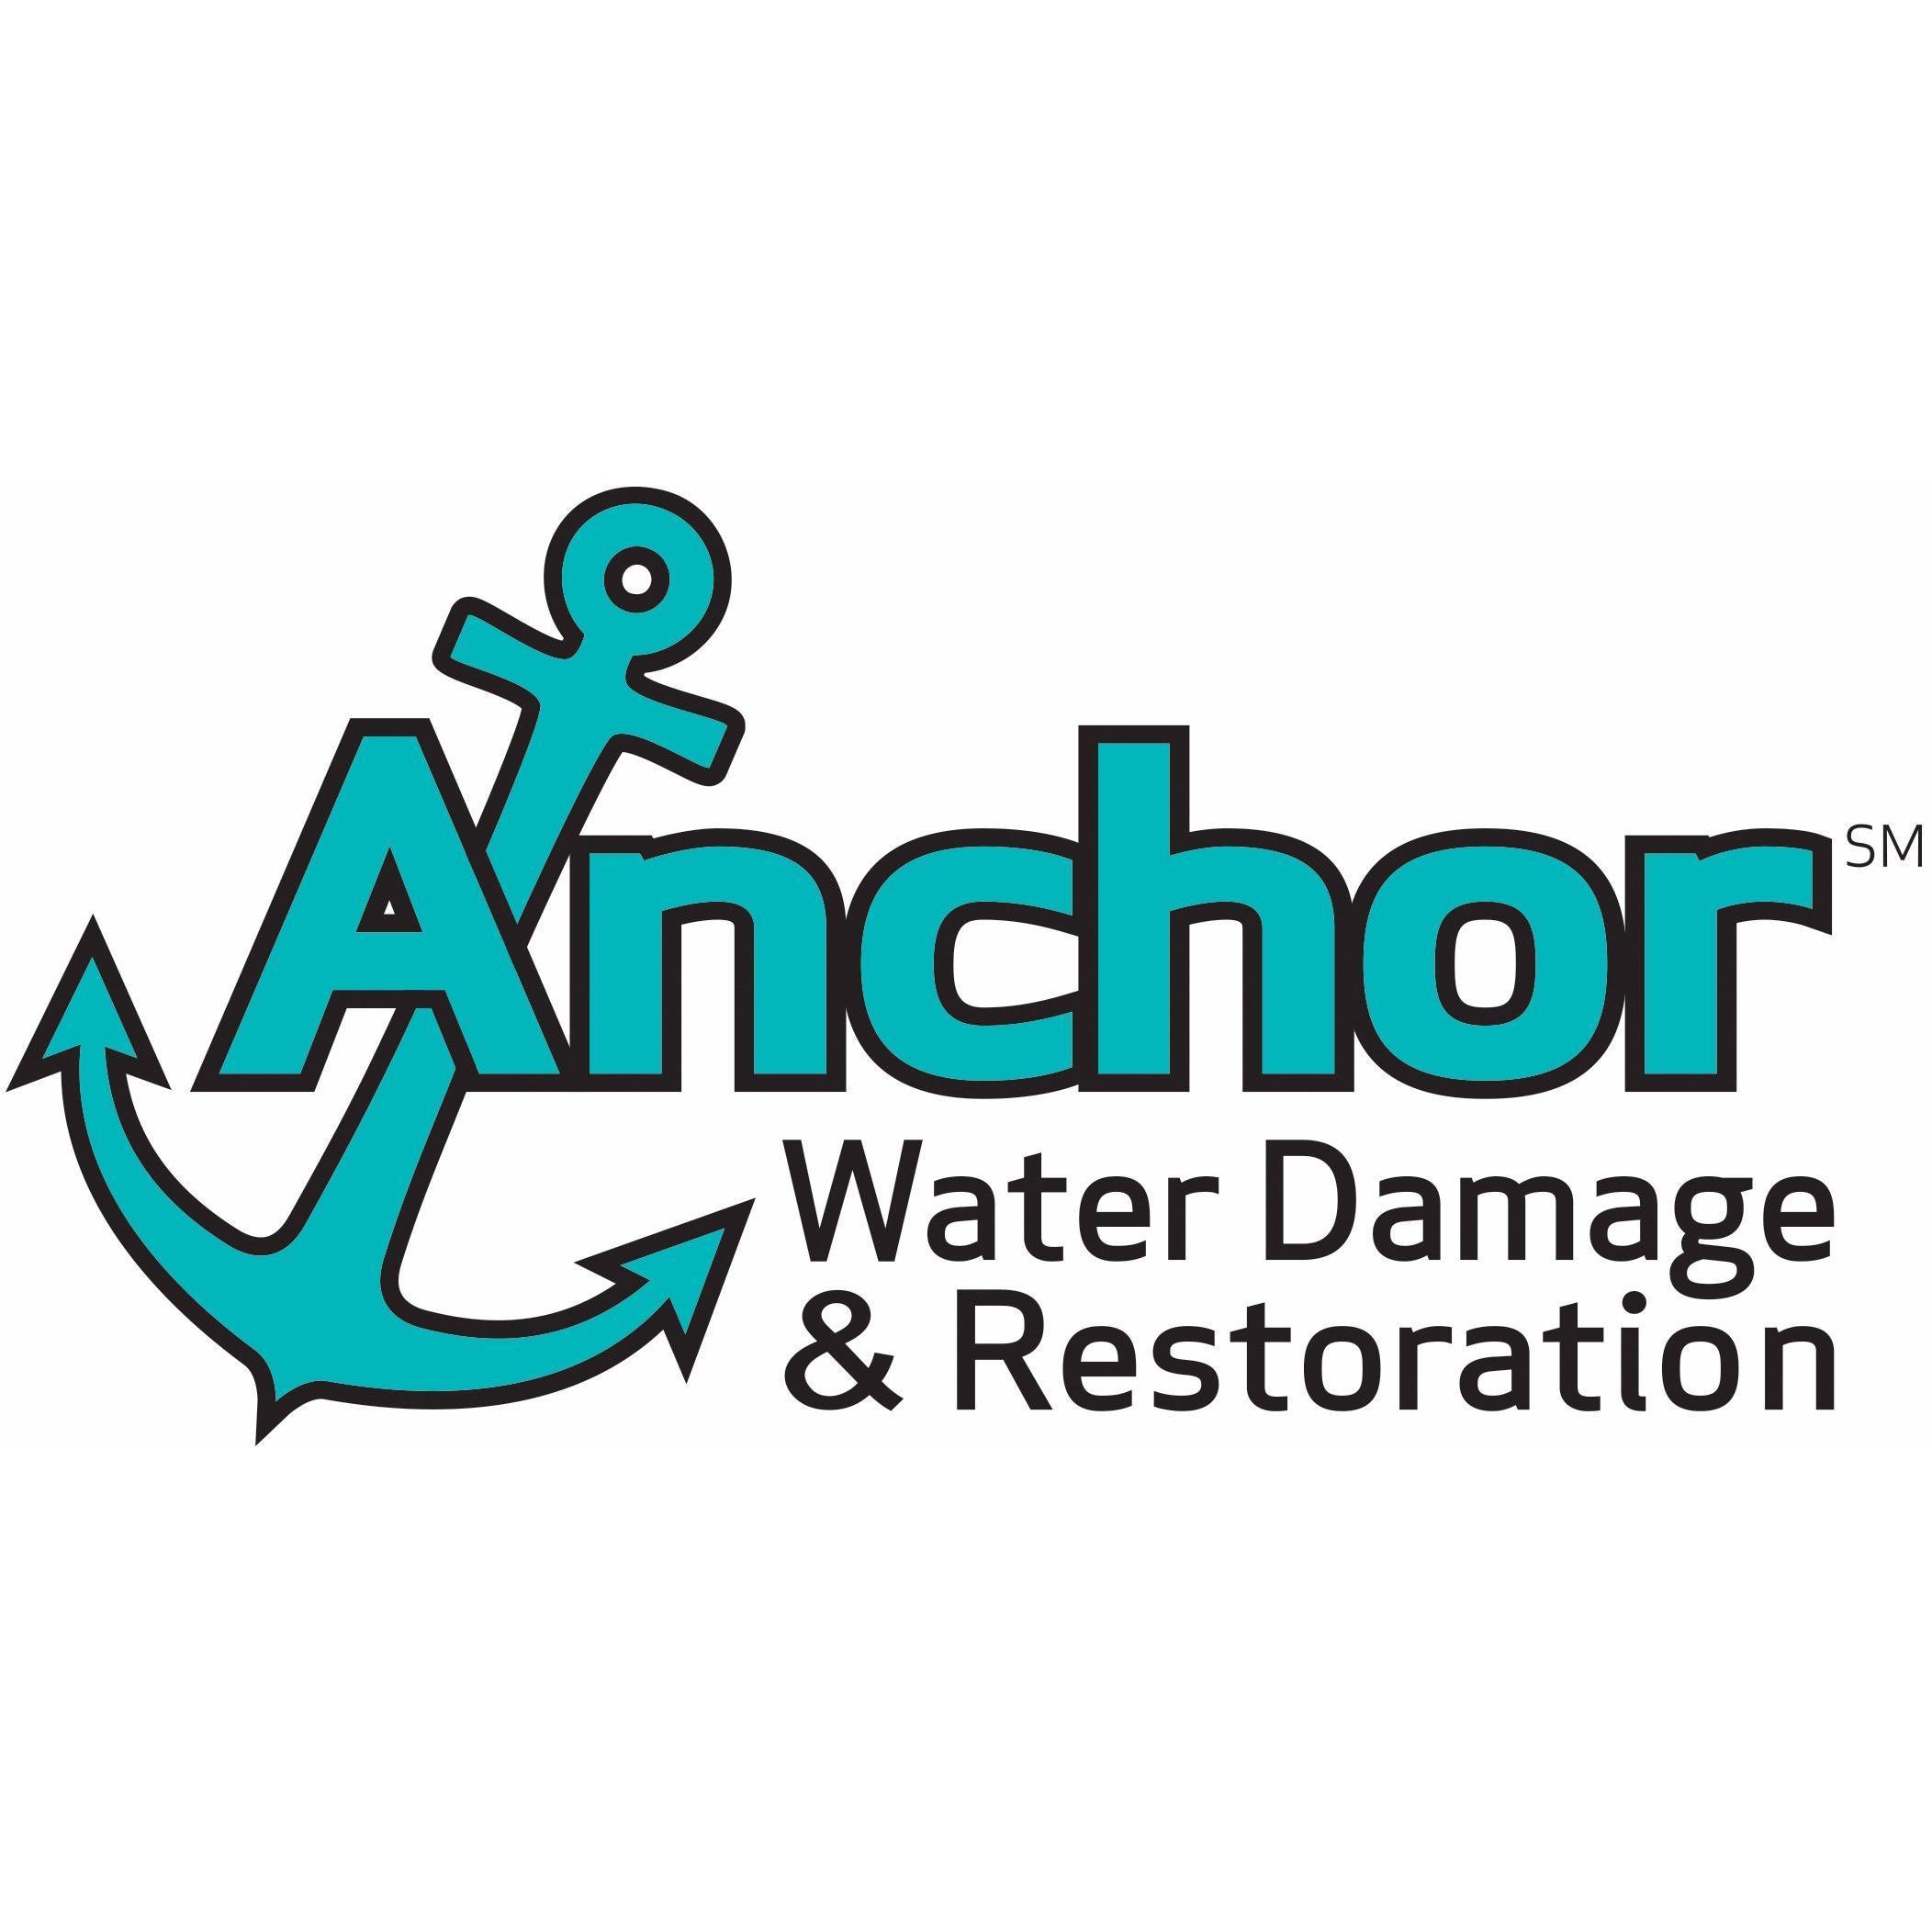 Anchor Water Damage & Restoration image 5